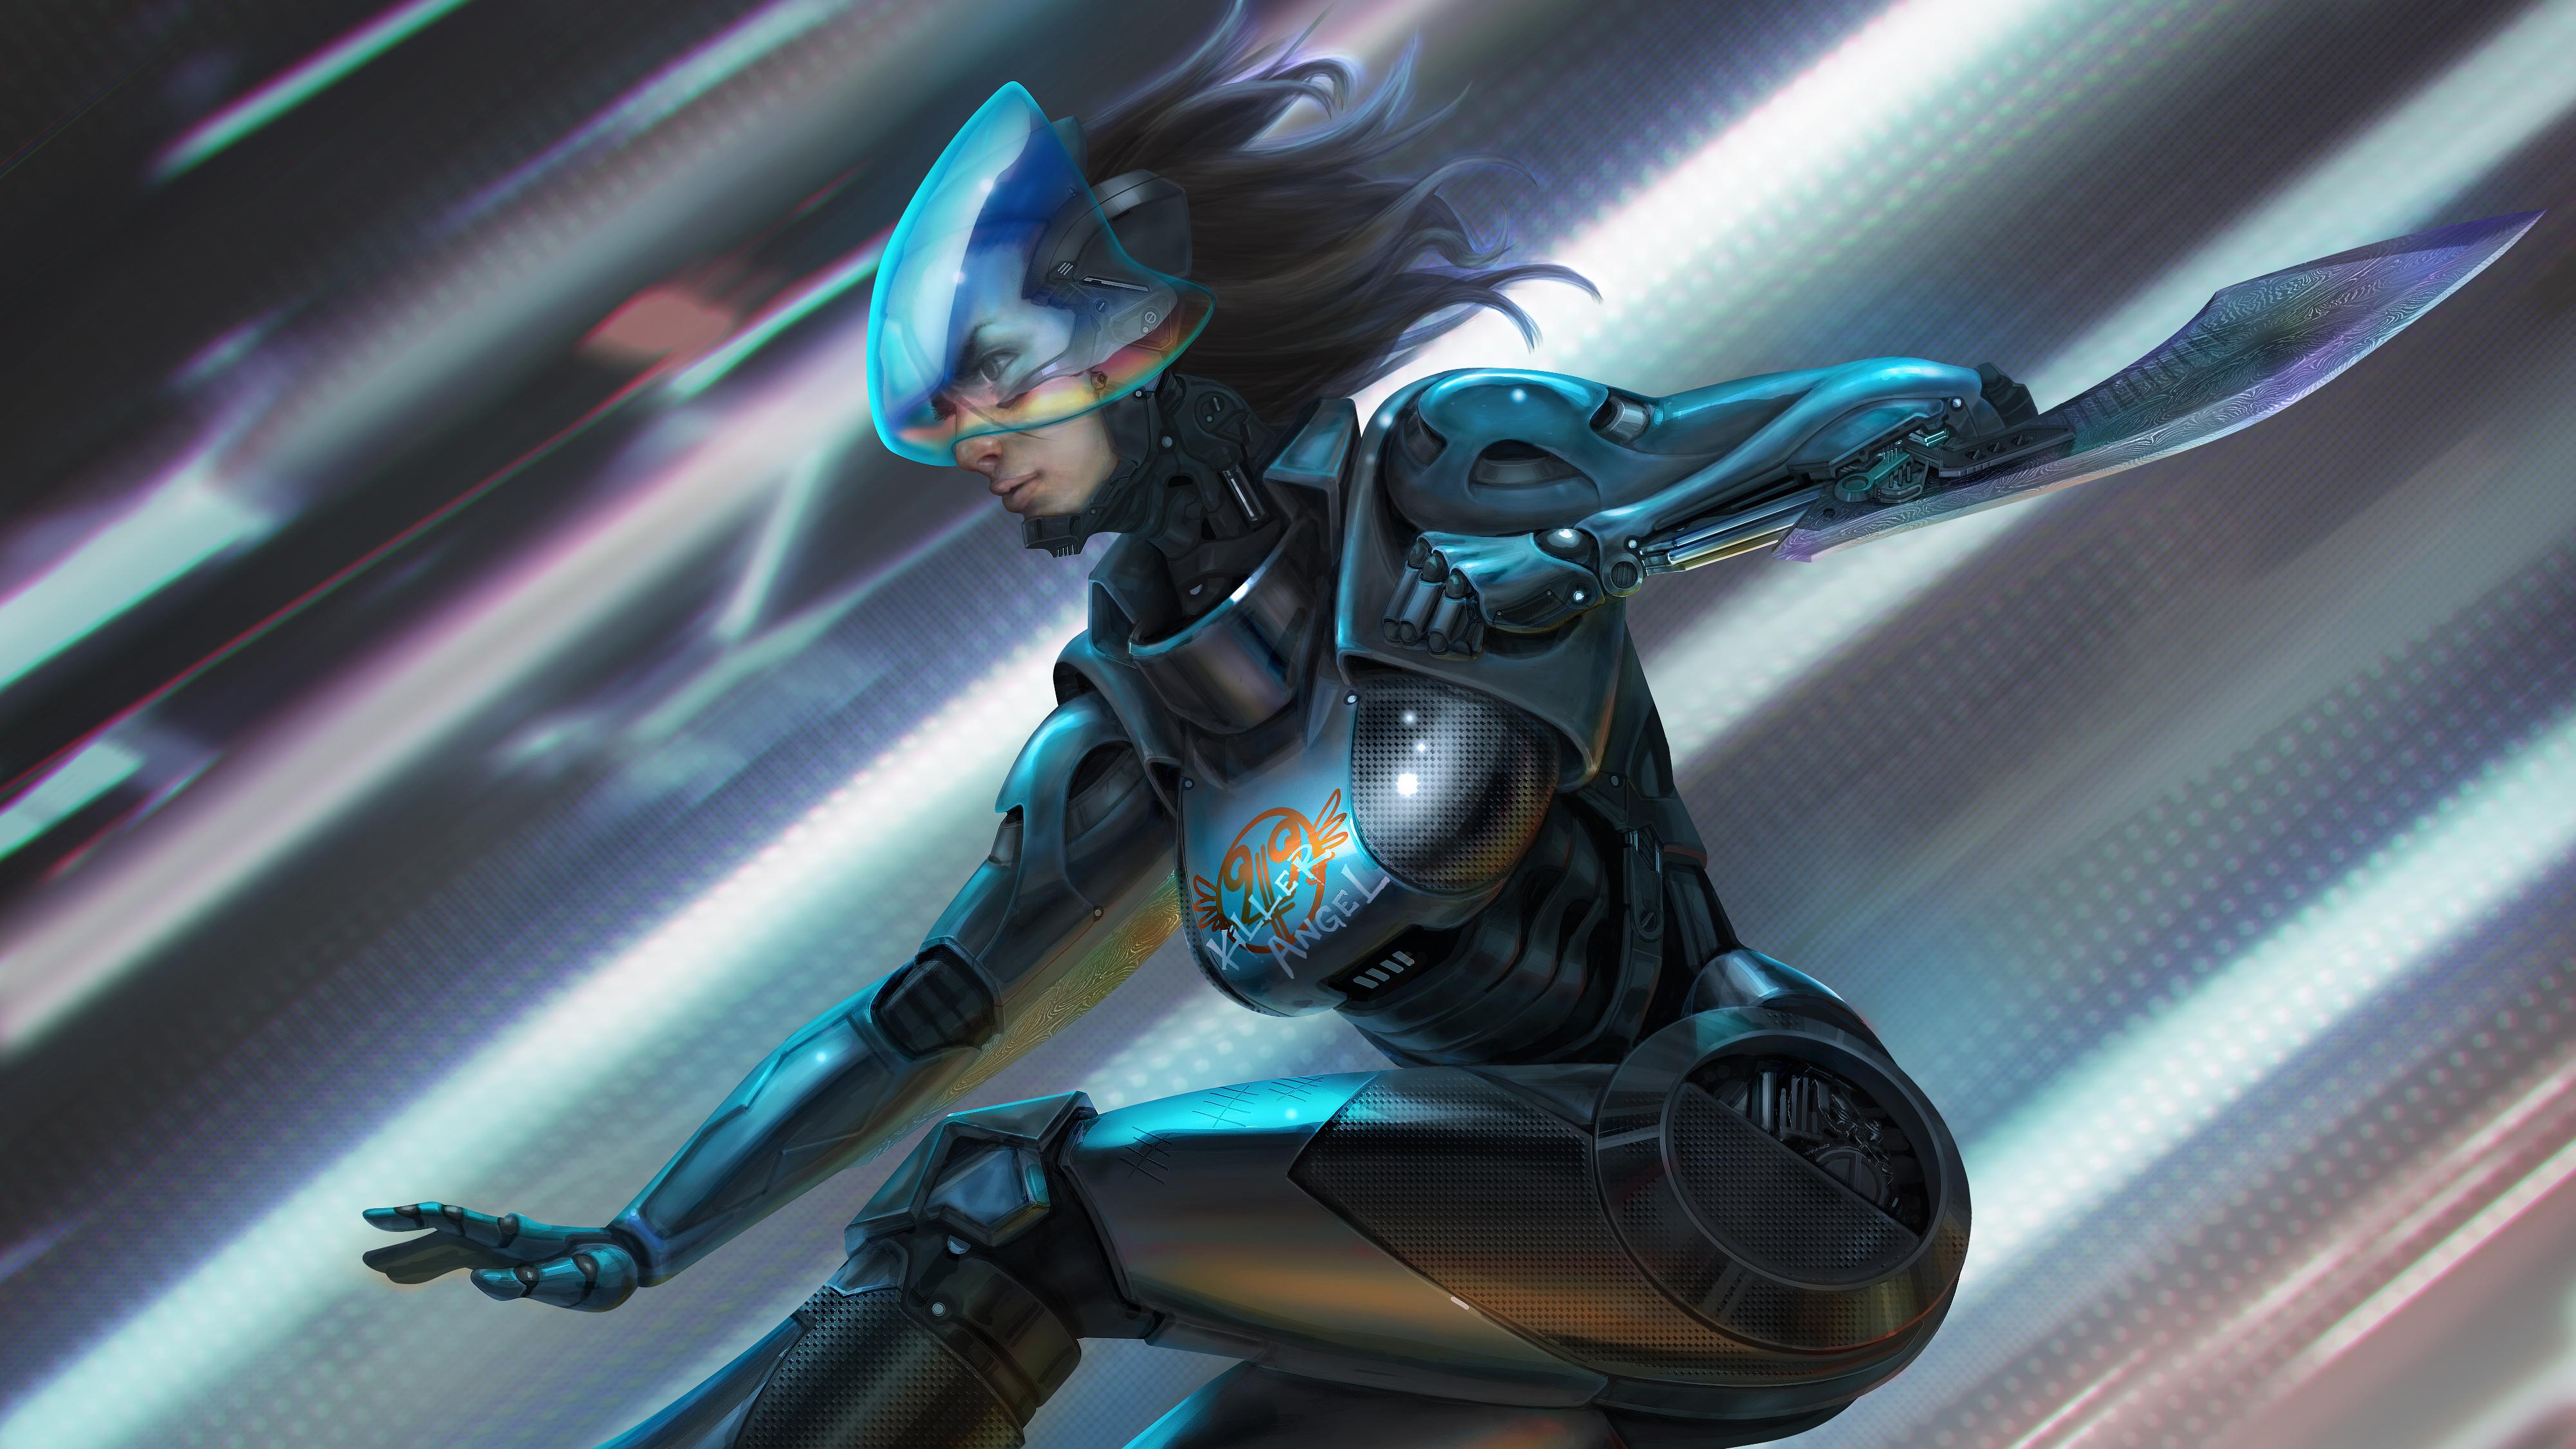 Alita Battle Angel 4k Artworks Hd Movies 4k Wallpapers Images